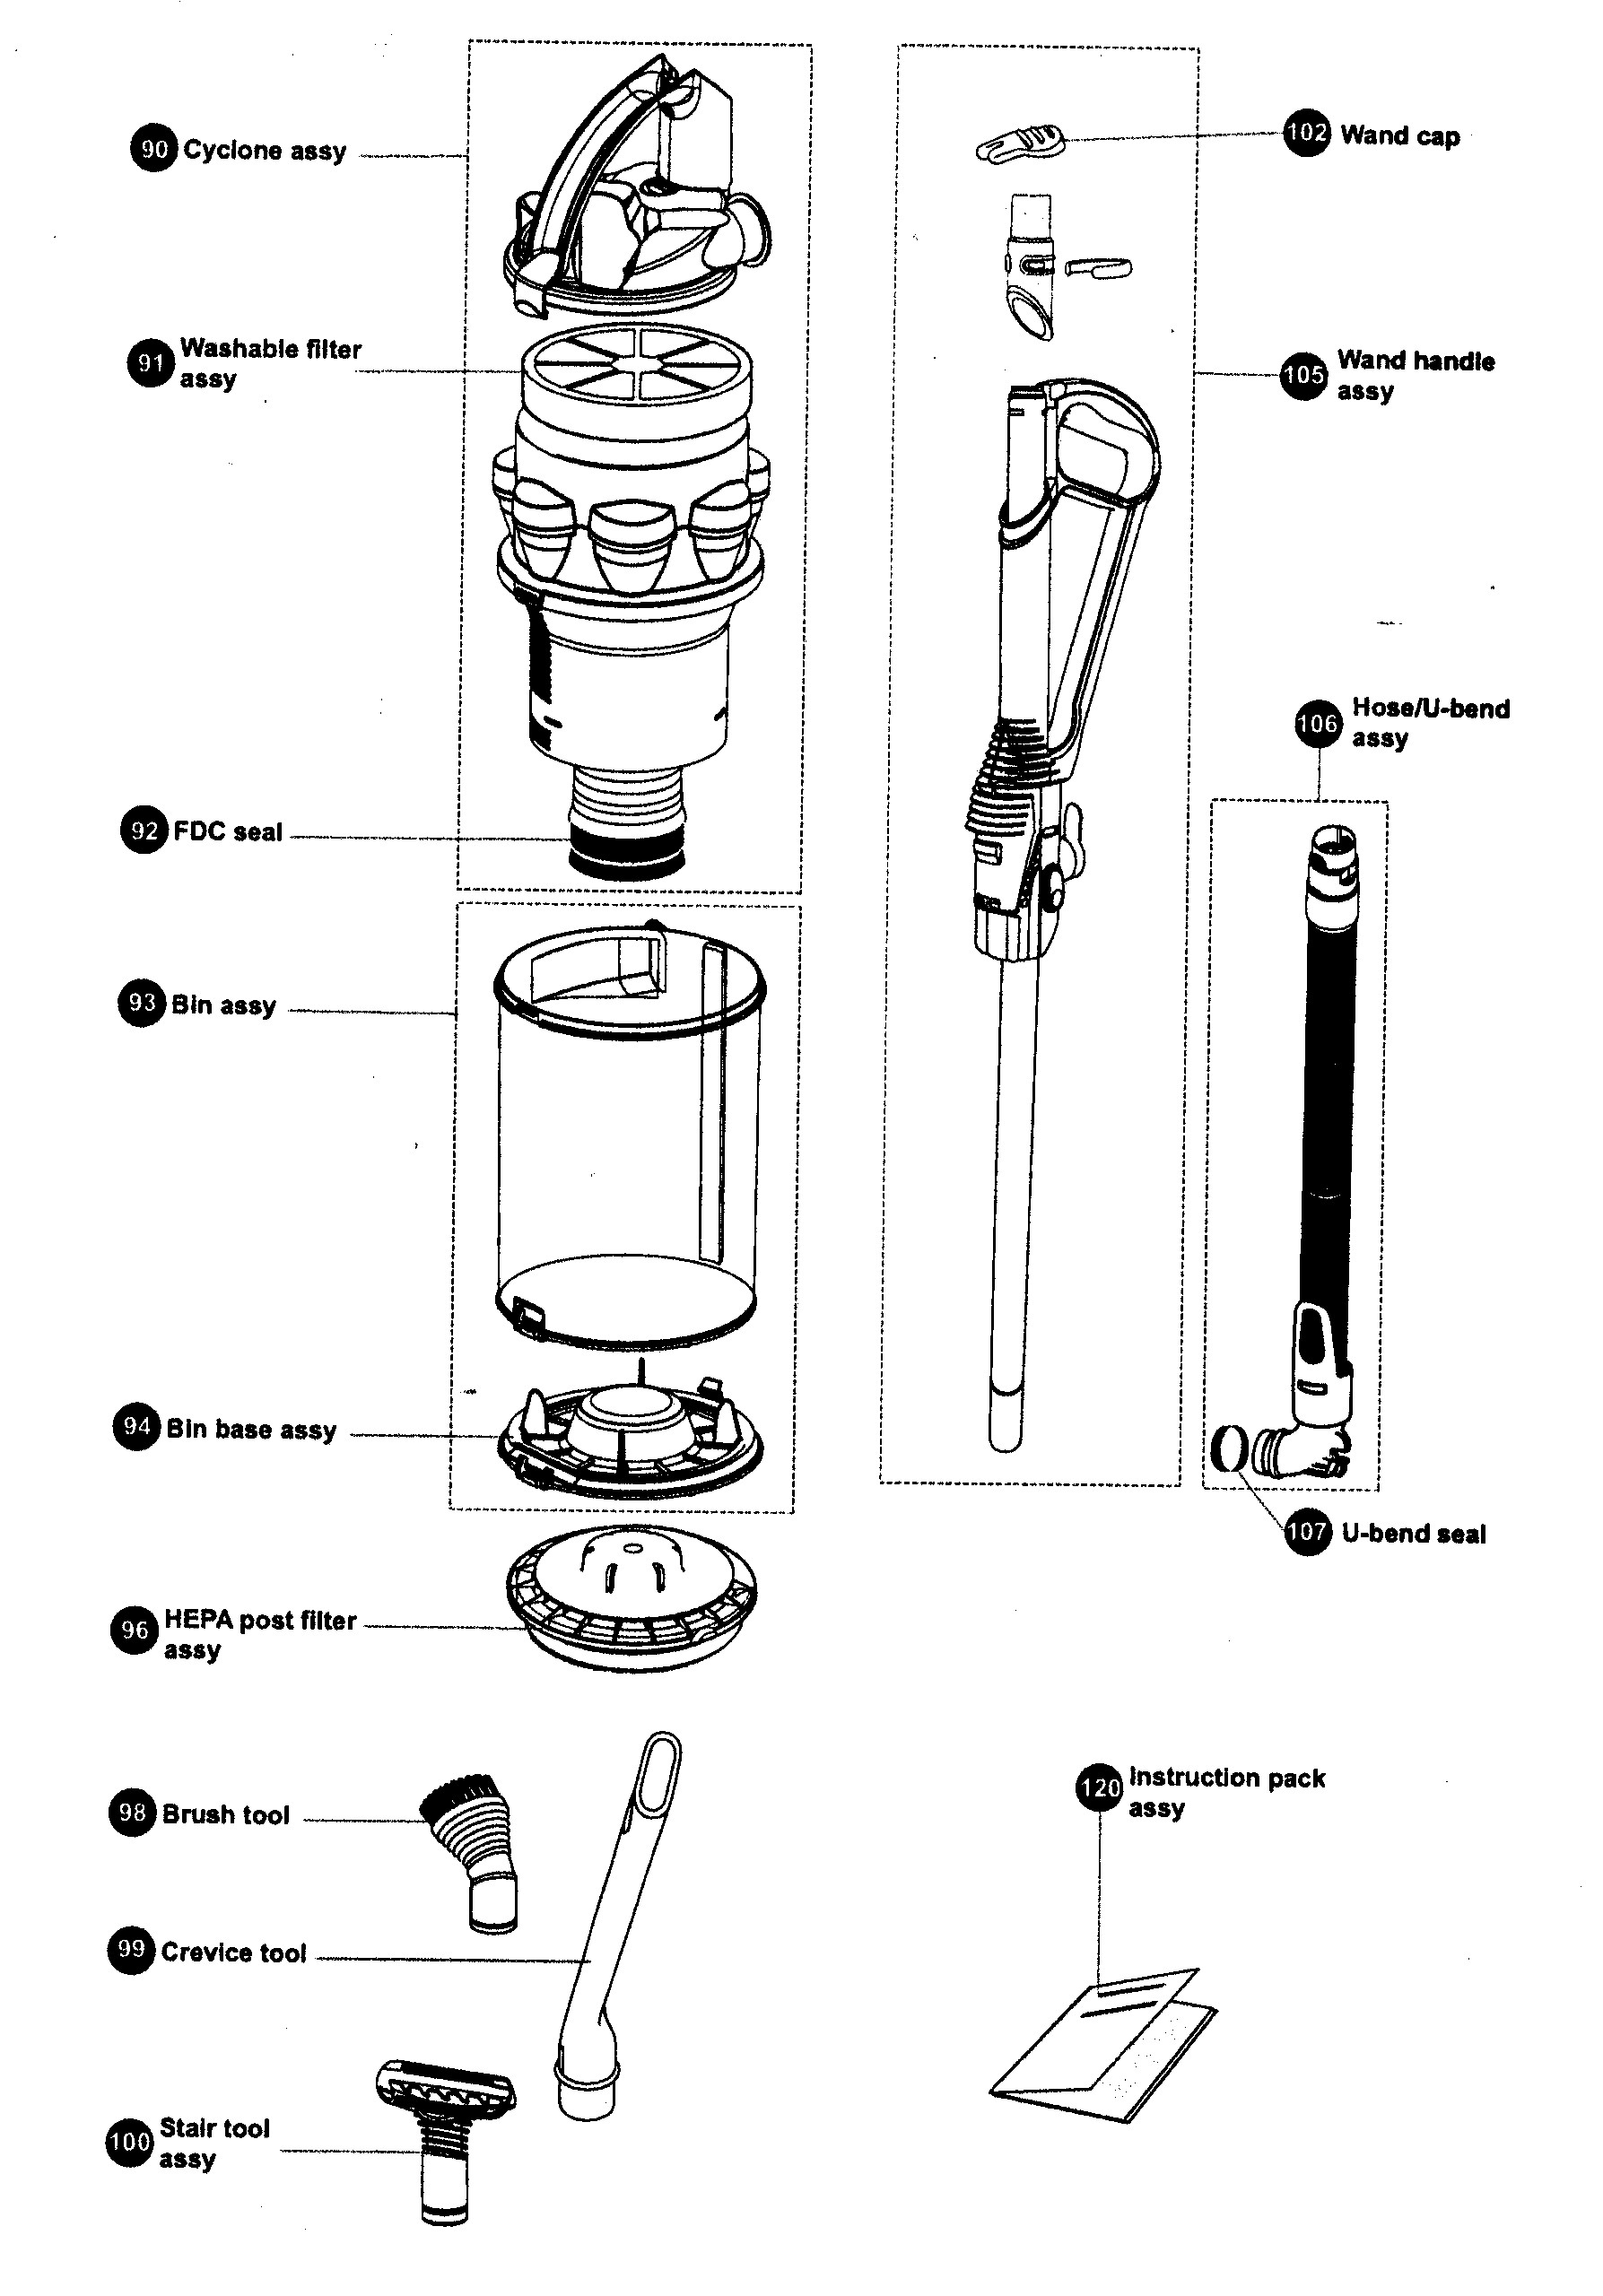 hight resolution of dyson dc25 parts diagram dyson vacuum diagram google search evolo pinterest of dyson dc25 parts diagram